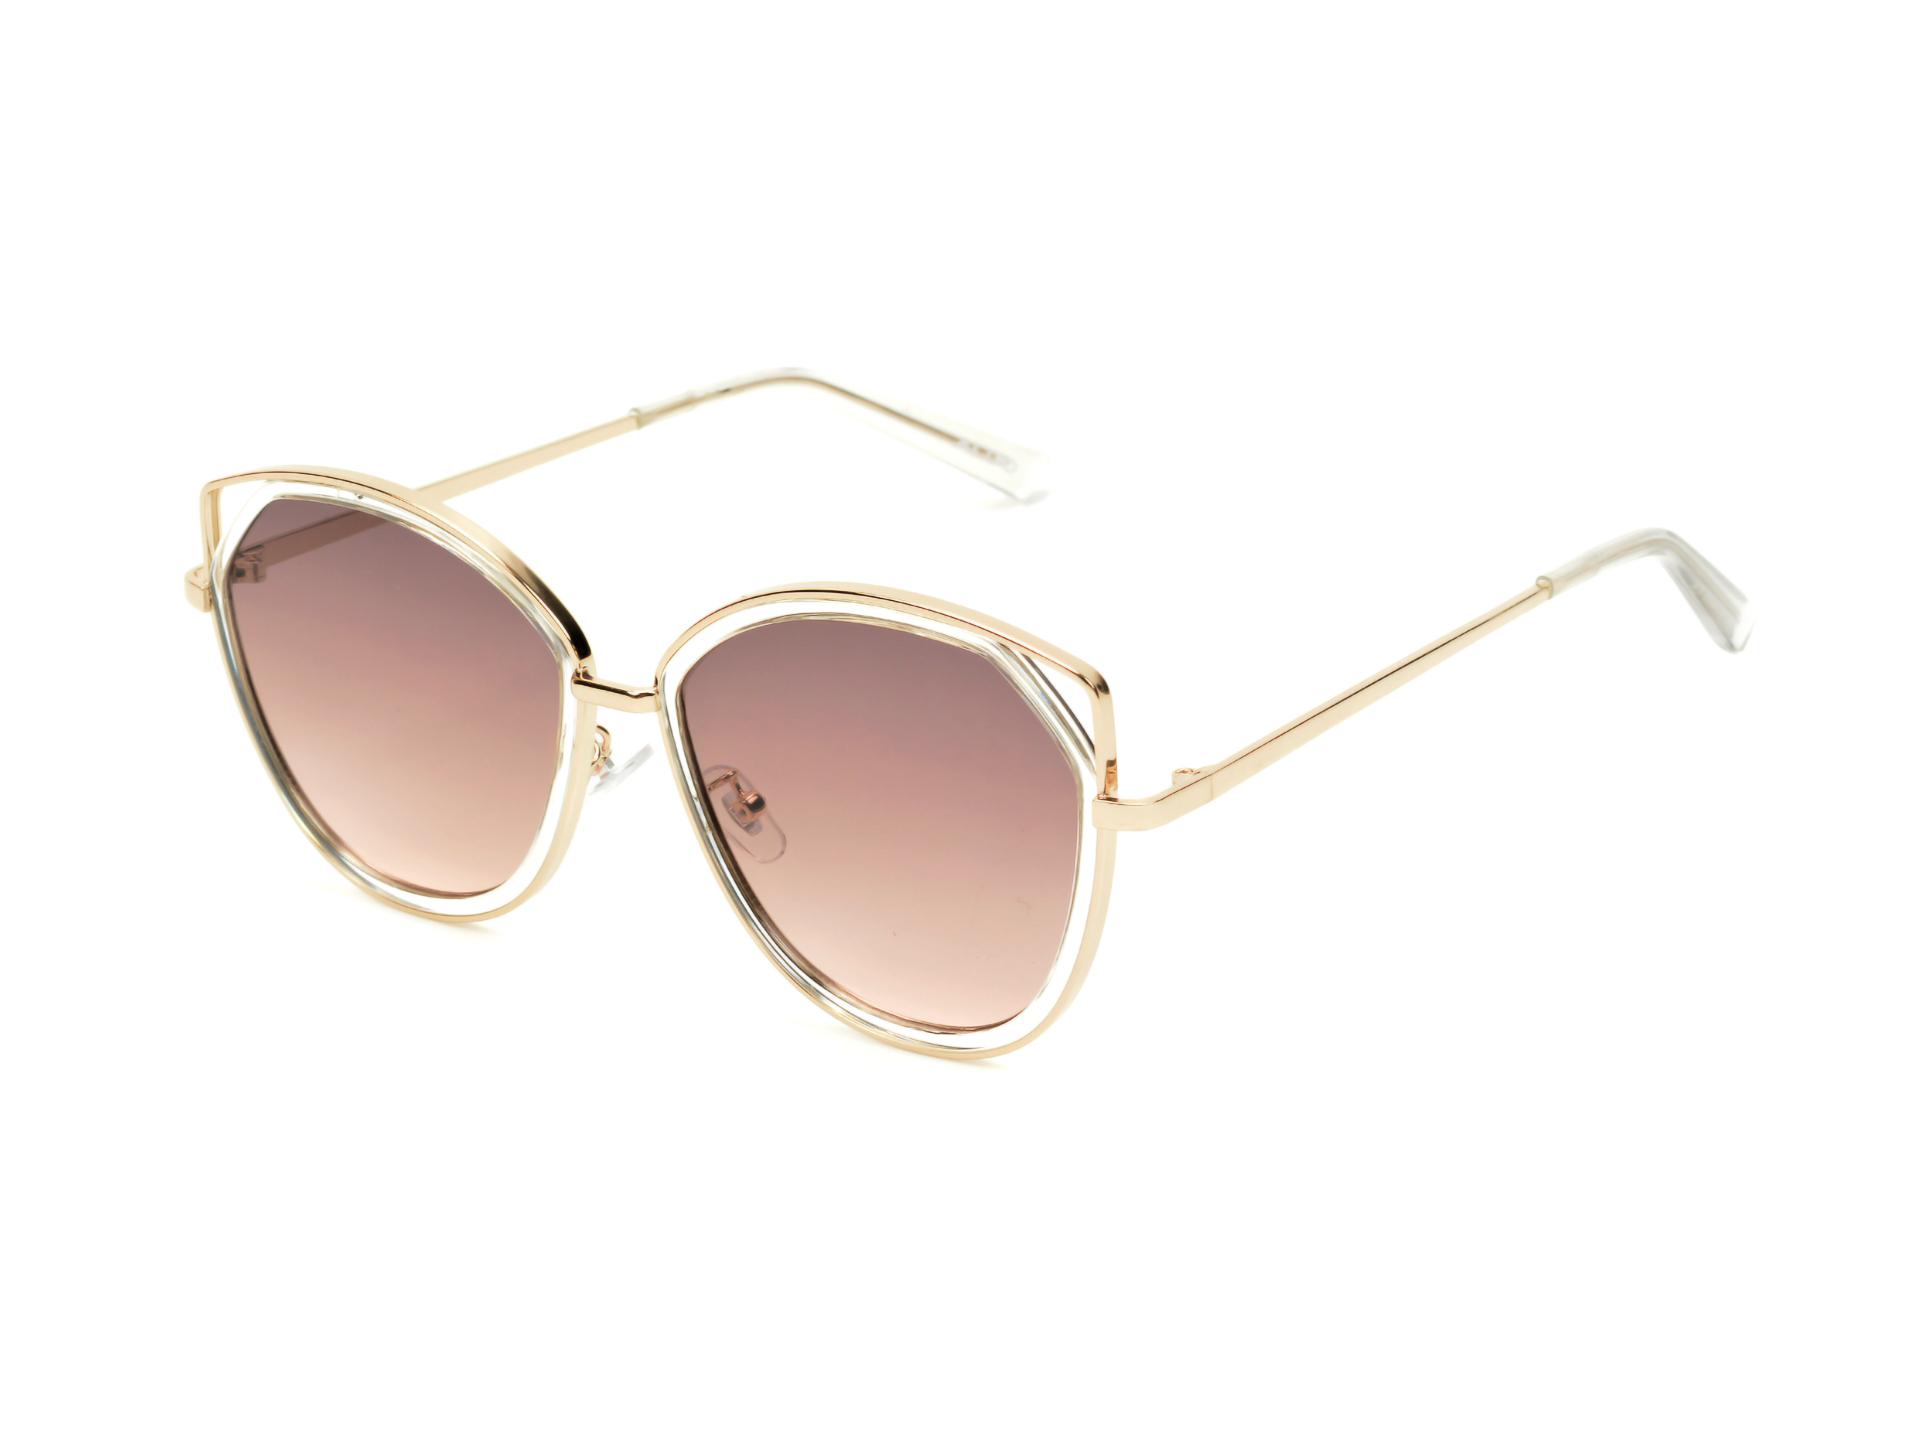 Ochelari de soare ALDO albi, Stercorea103, din PVC imagine